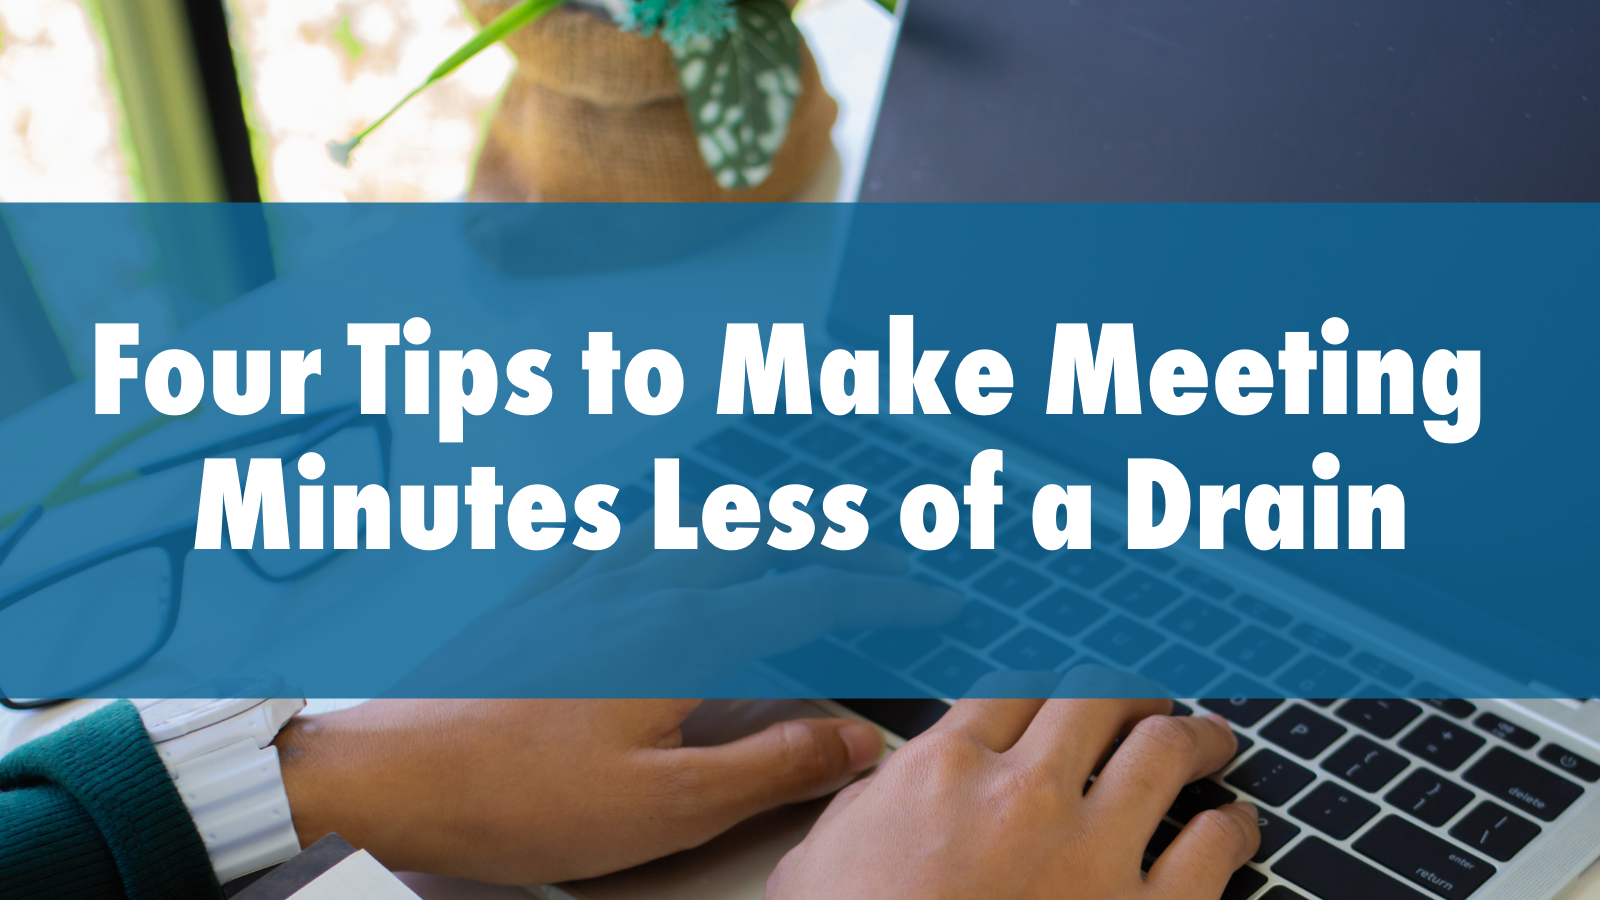 Four tips header